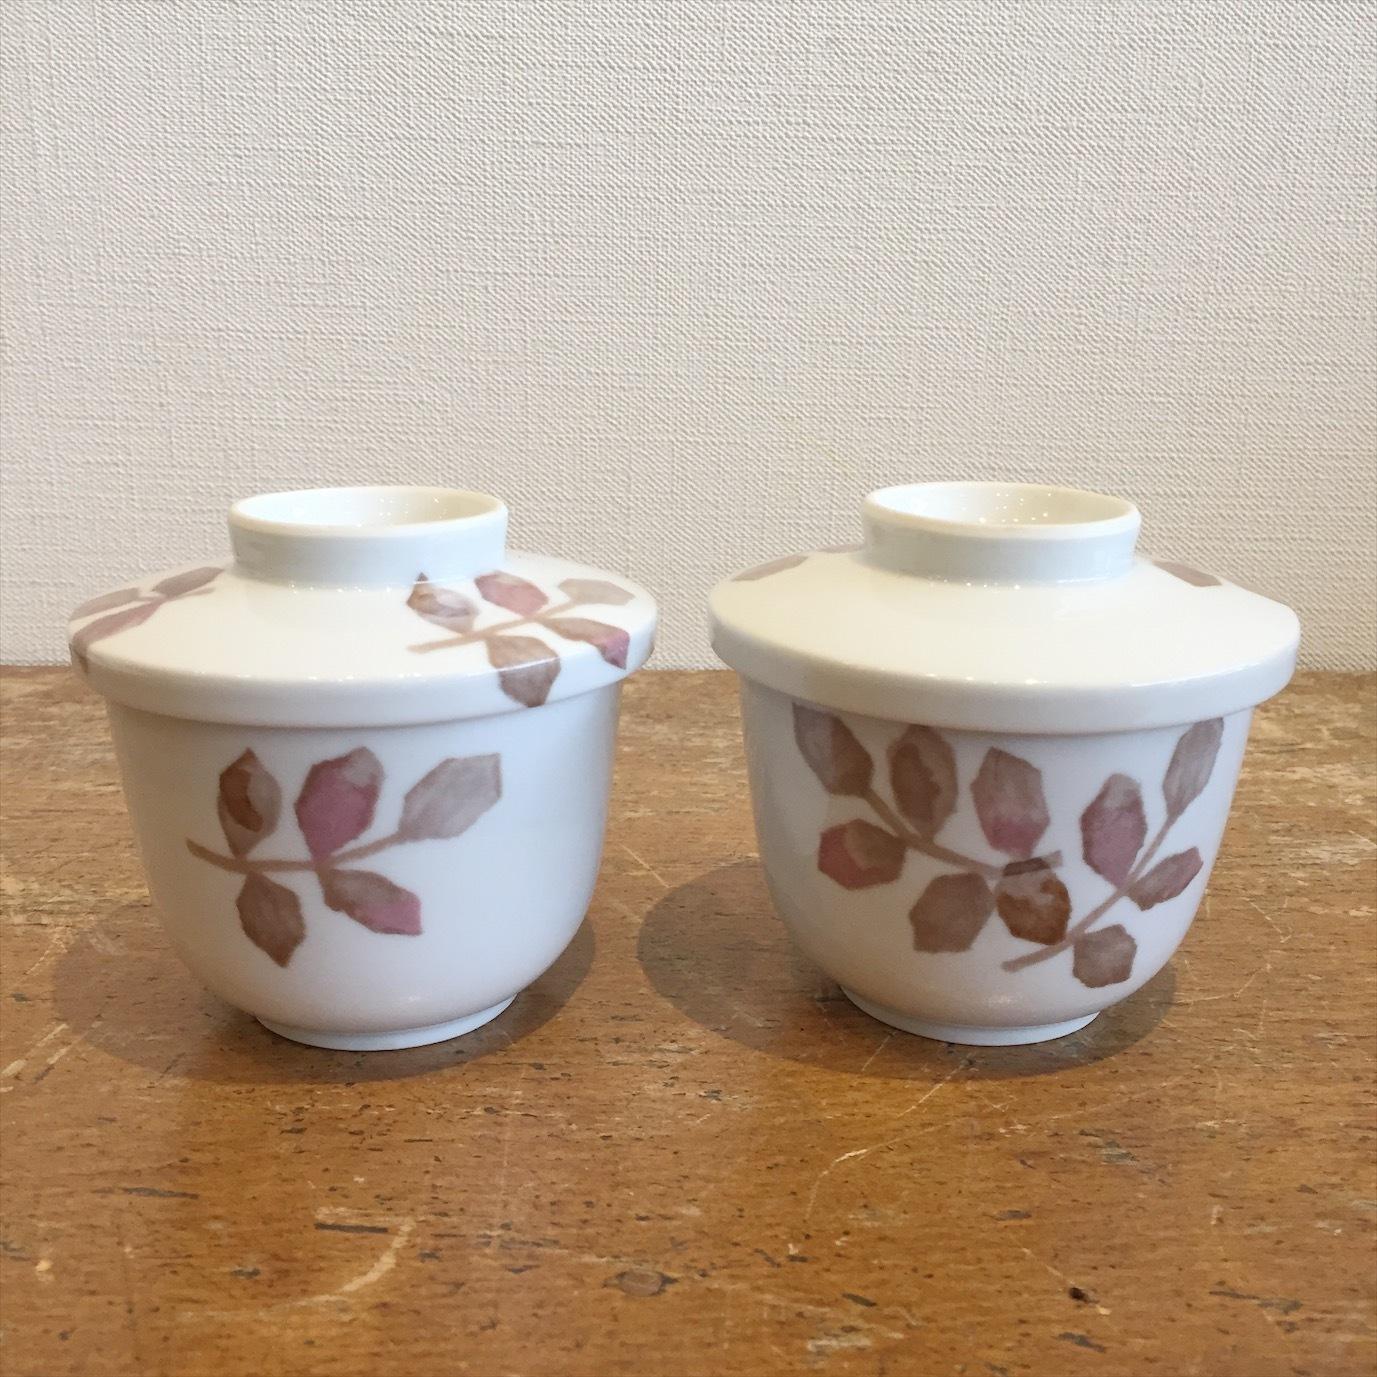 MEITO 茶碗蒸し器